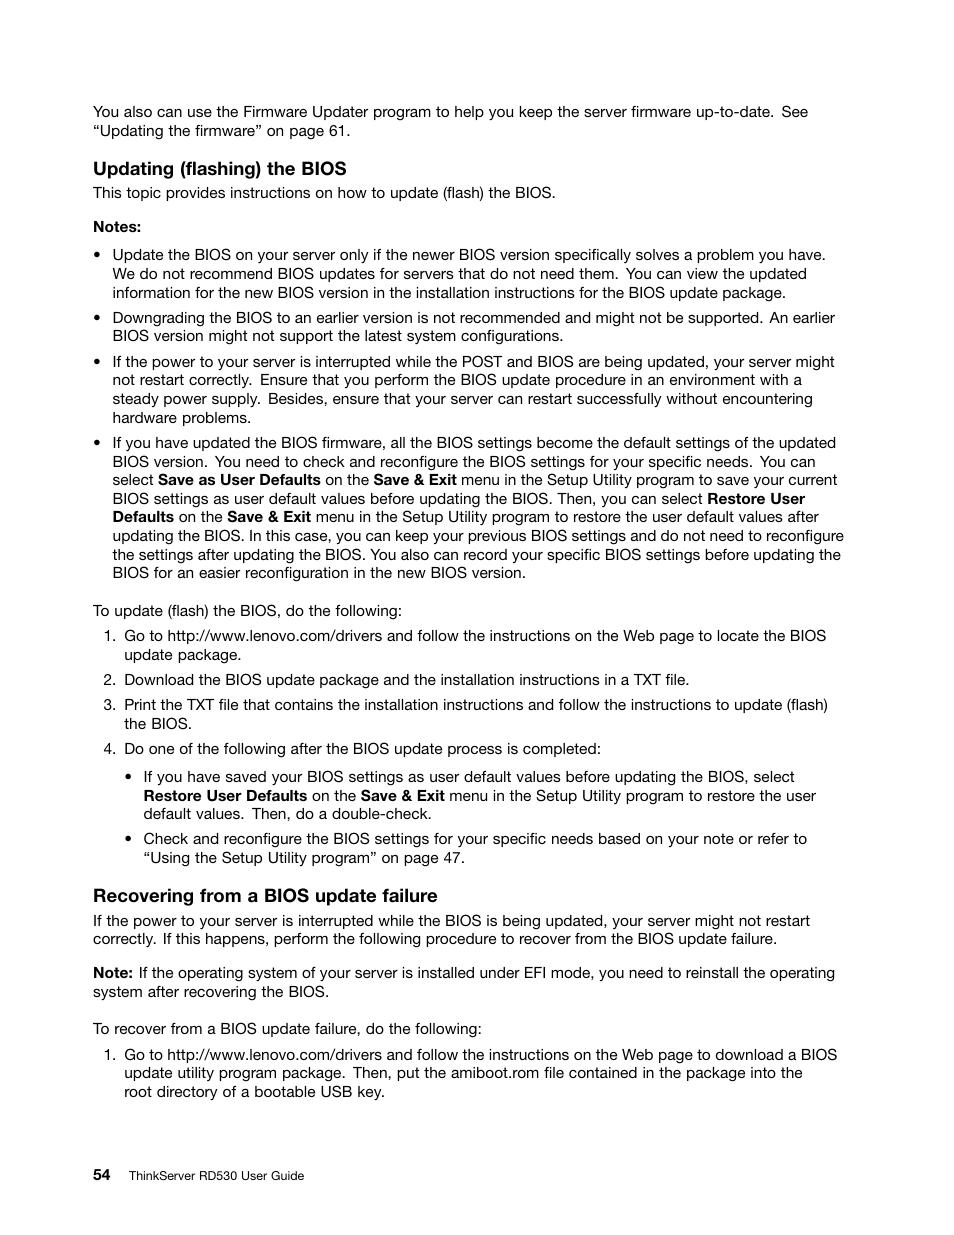 Updating (flashing) the bios | Lenovo ThinkServer RD530 User